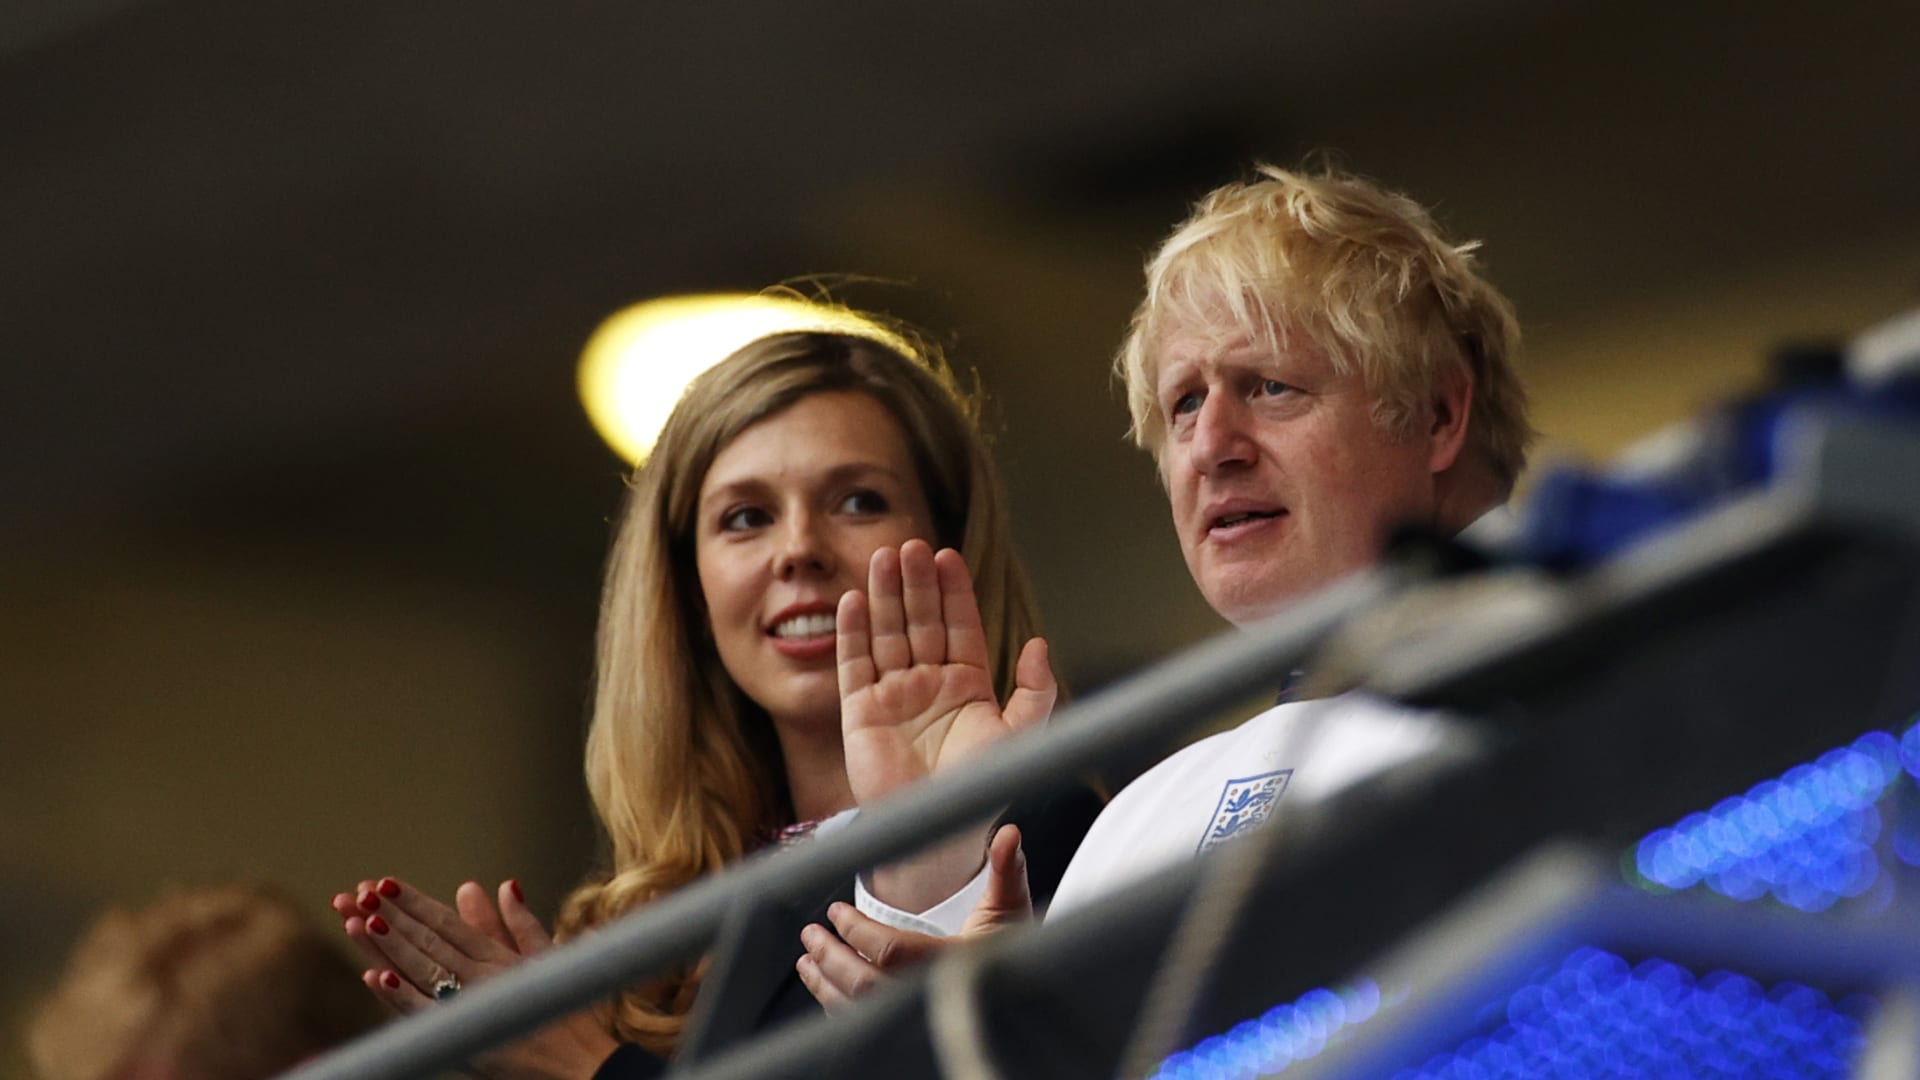 رئيس الوزراء البريطاني بوريس جونسون وزوجته كاري جونسون